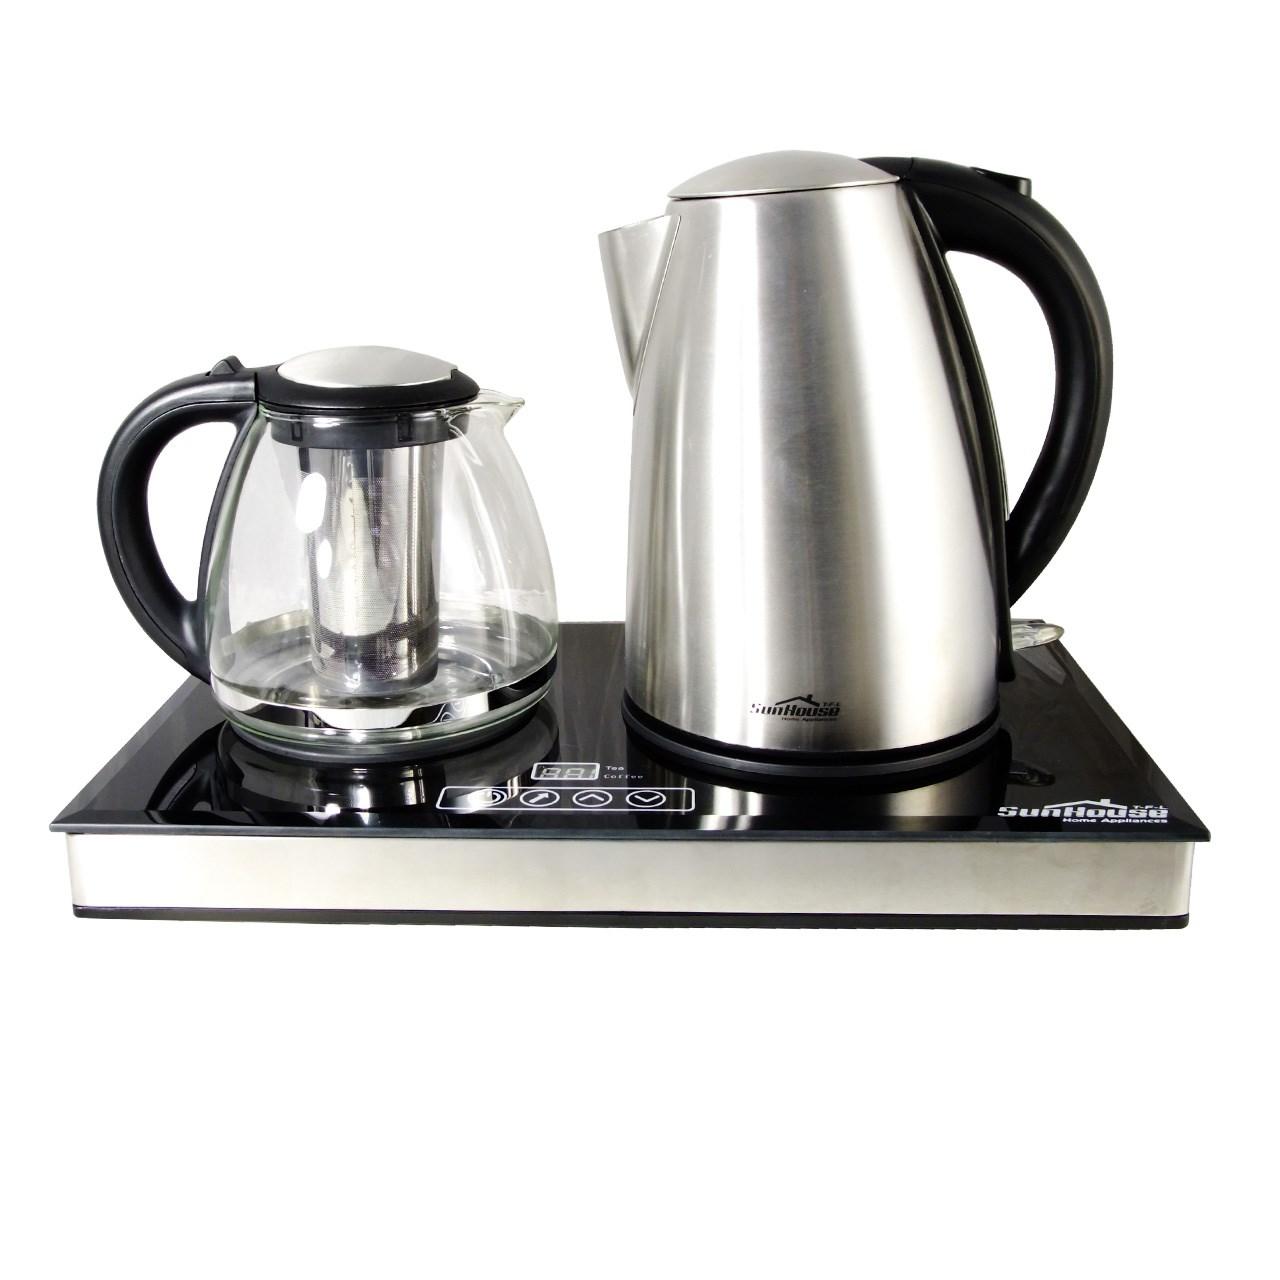 چای ساز سان هوس مدل TTG-595B